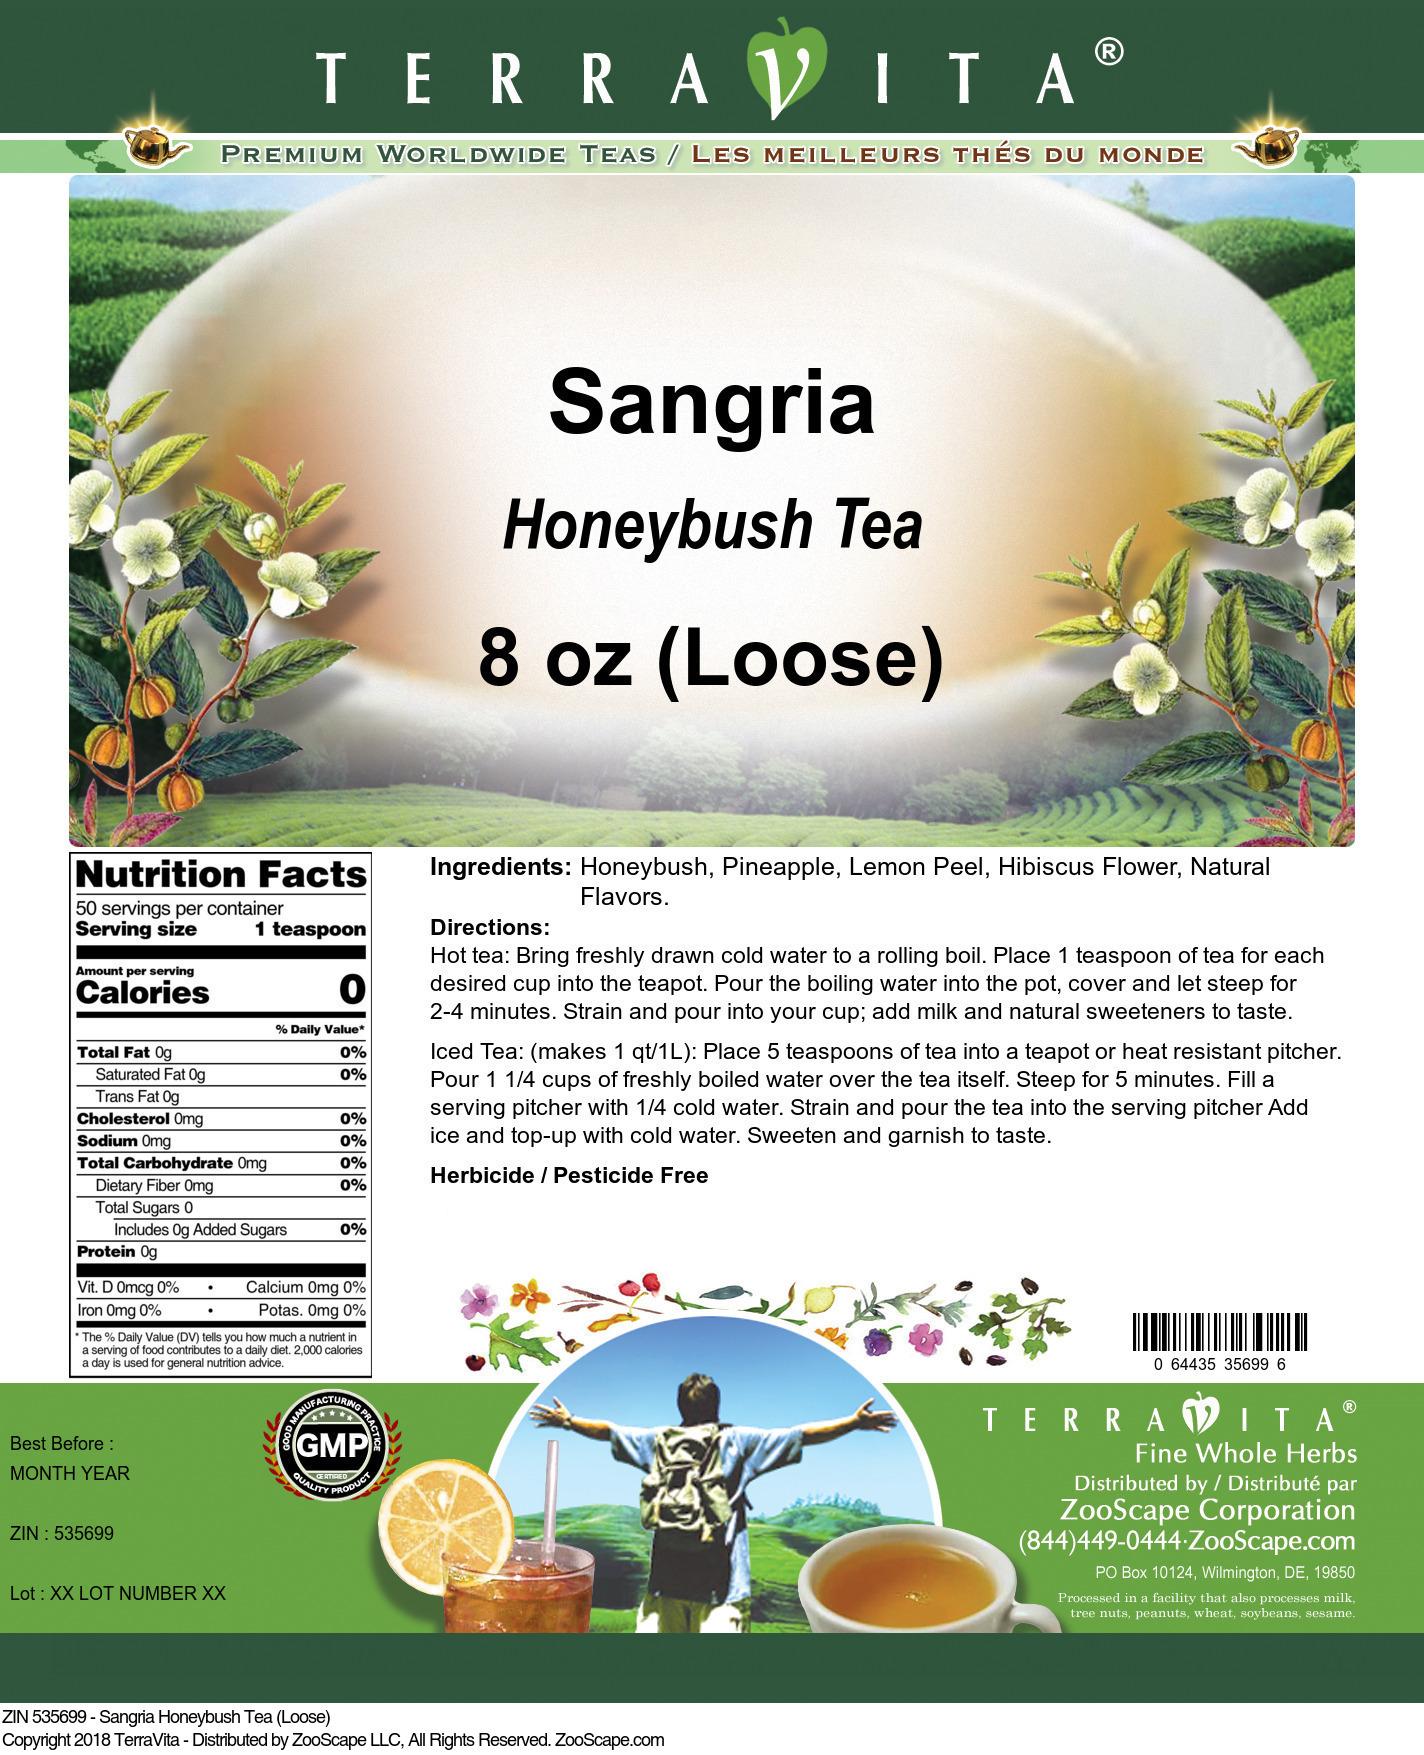 Sangria Honeybush Tea